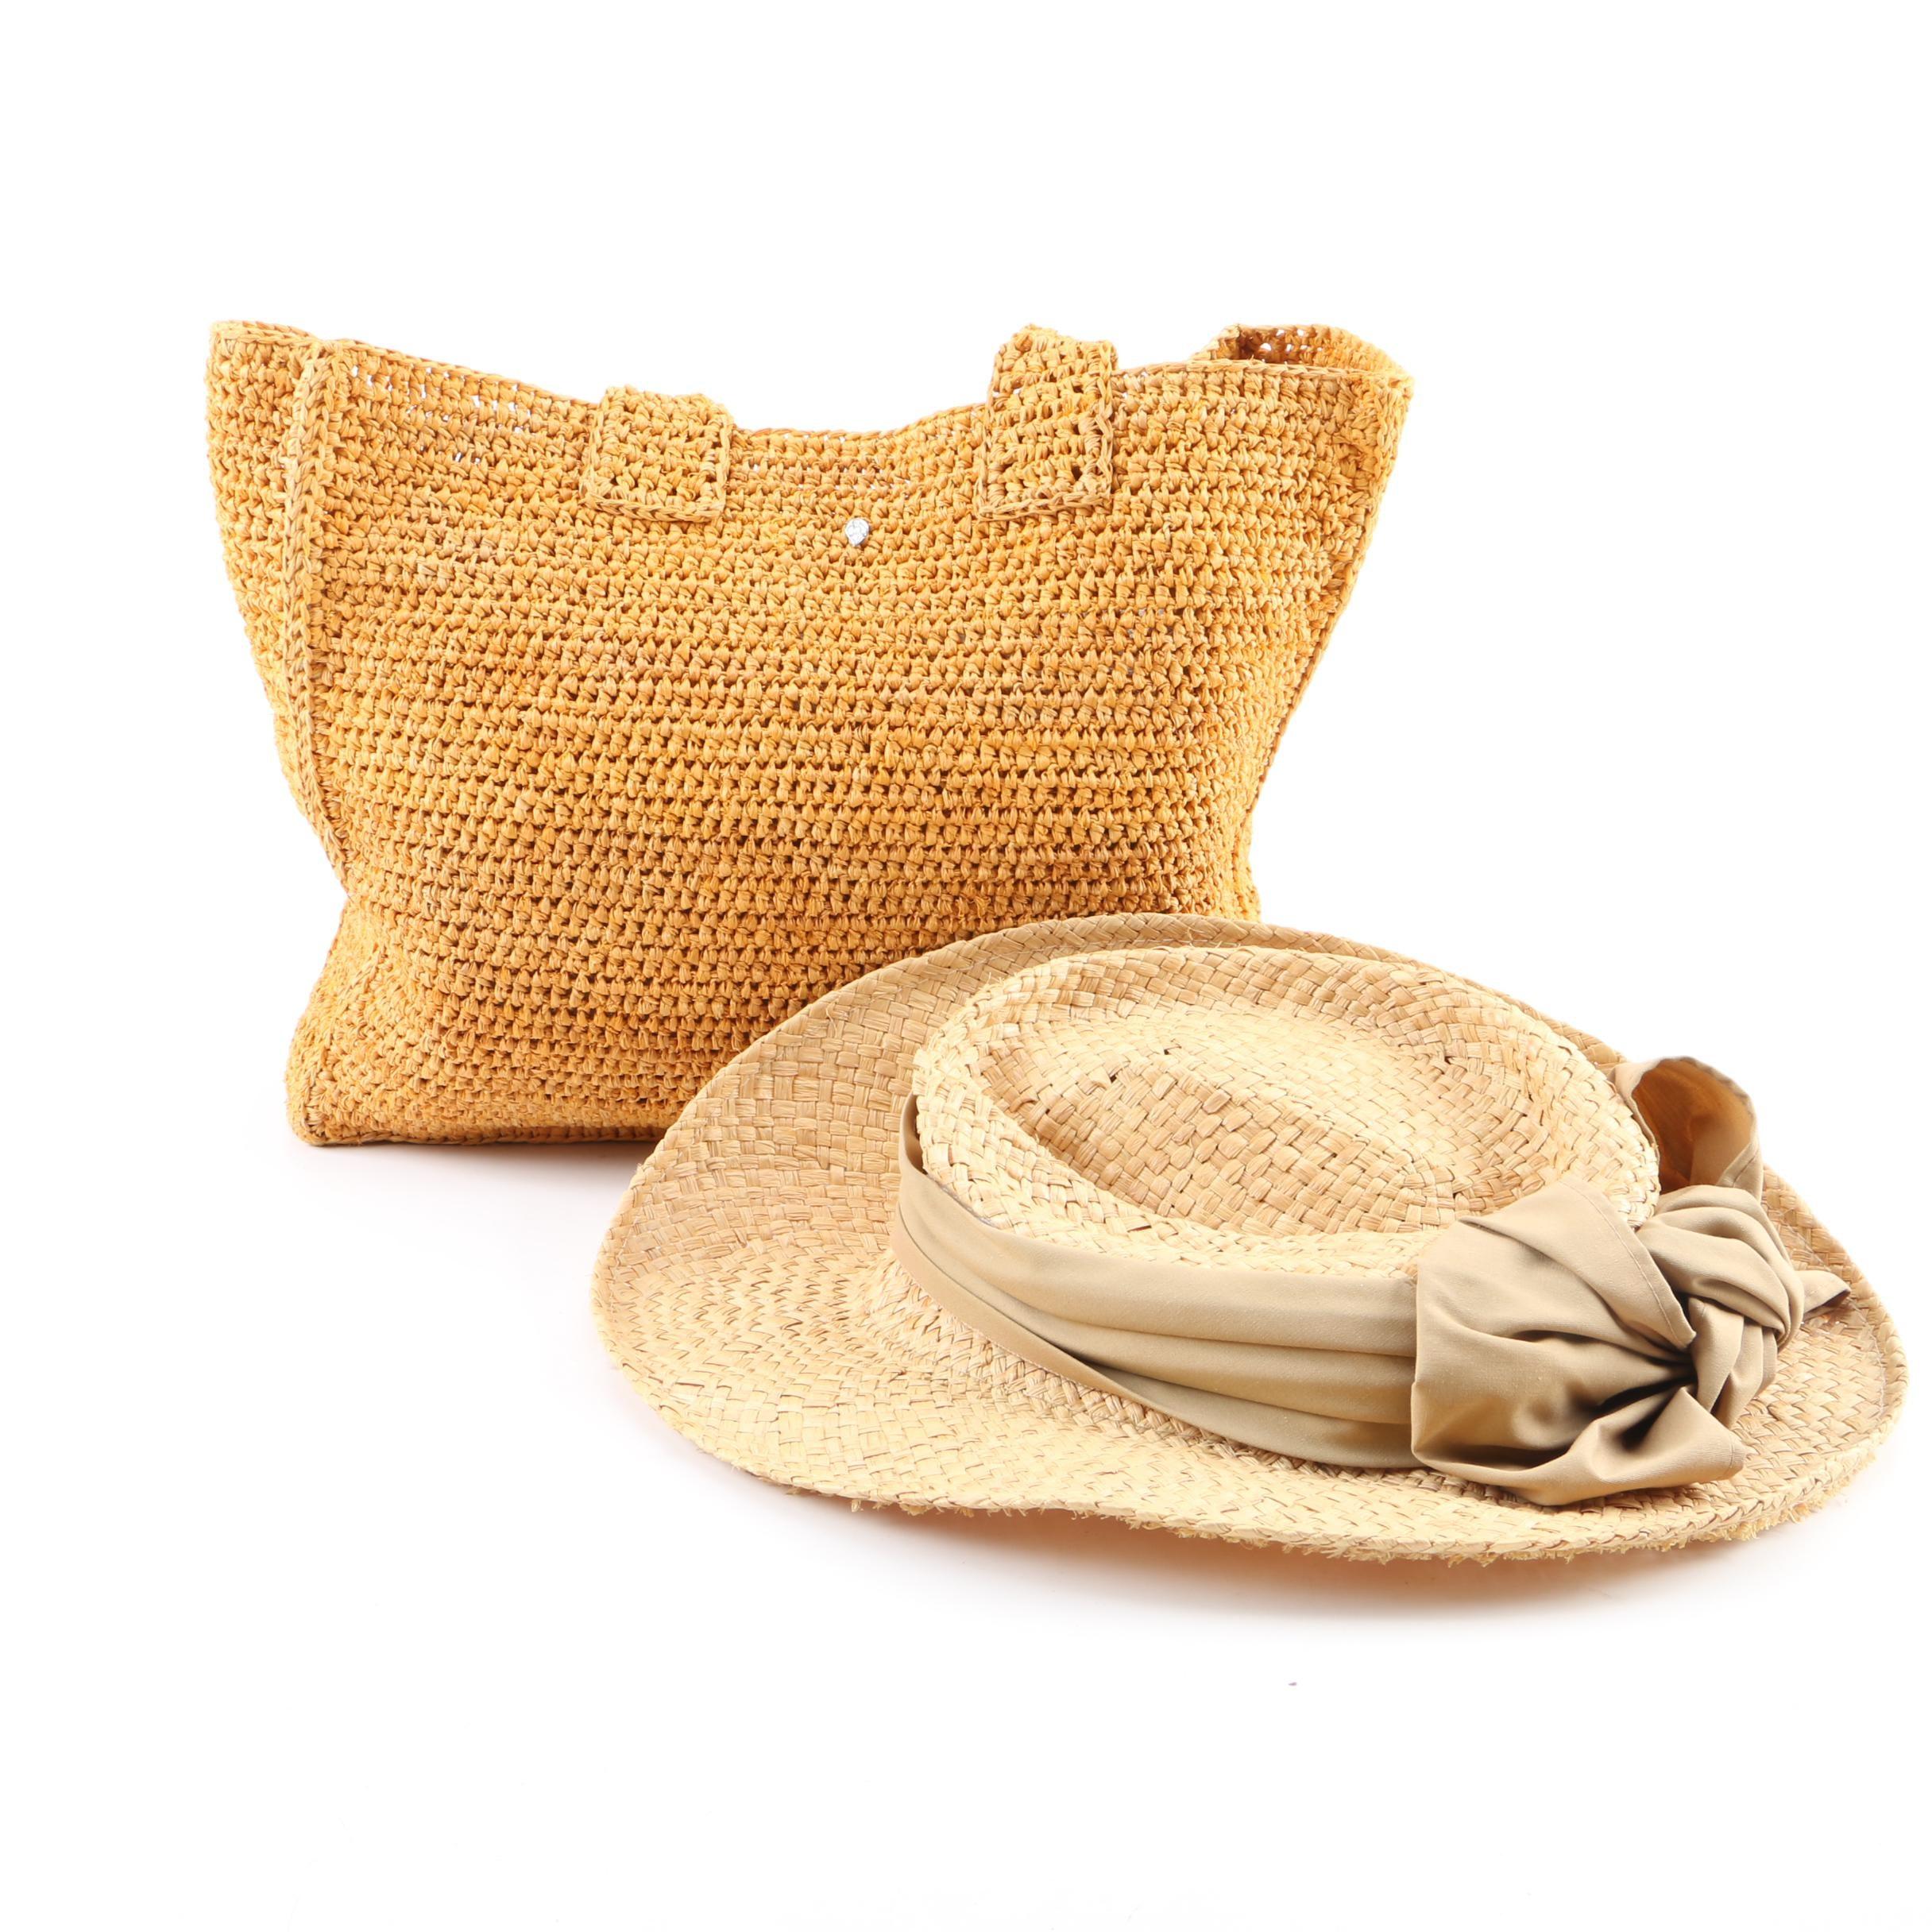 Helen Kaminski of Australia Woven Raffia Tote and Firethorn Woven Hat